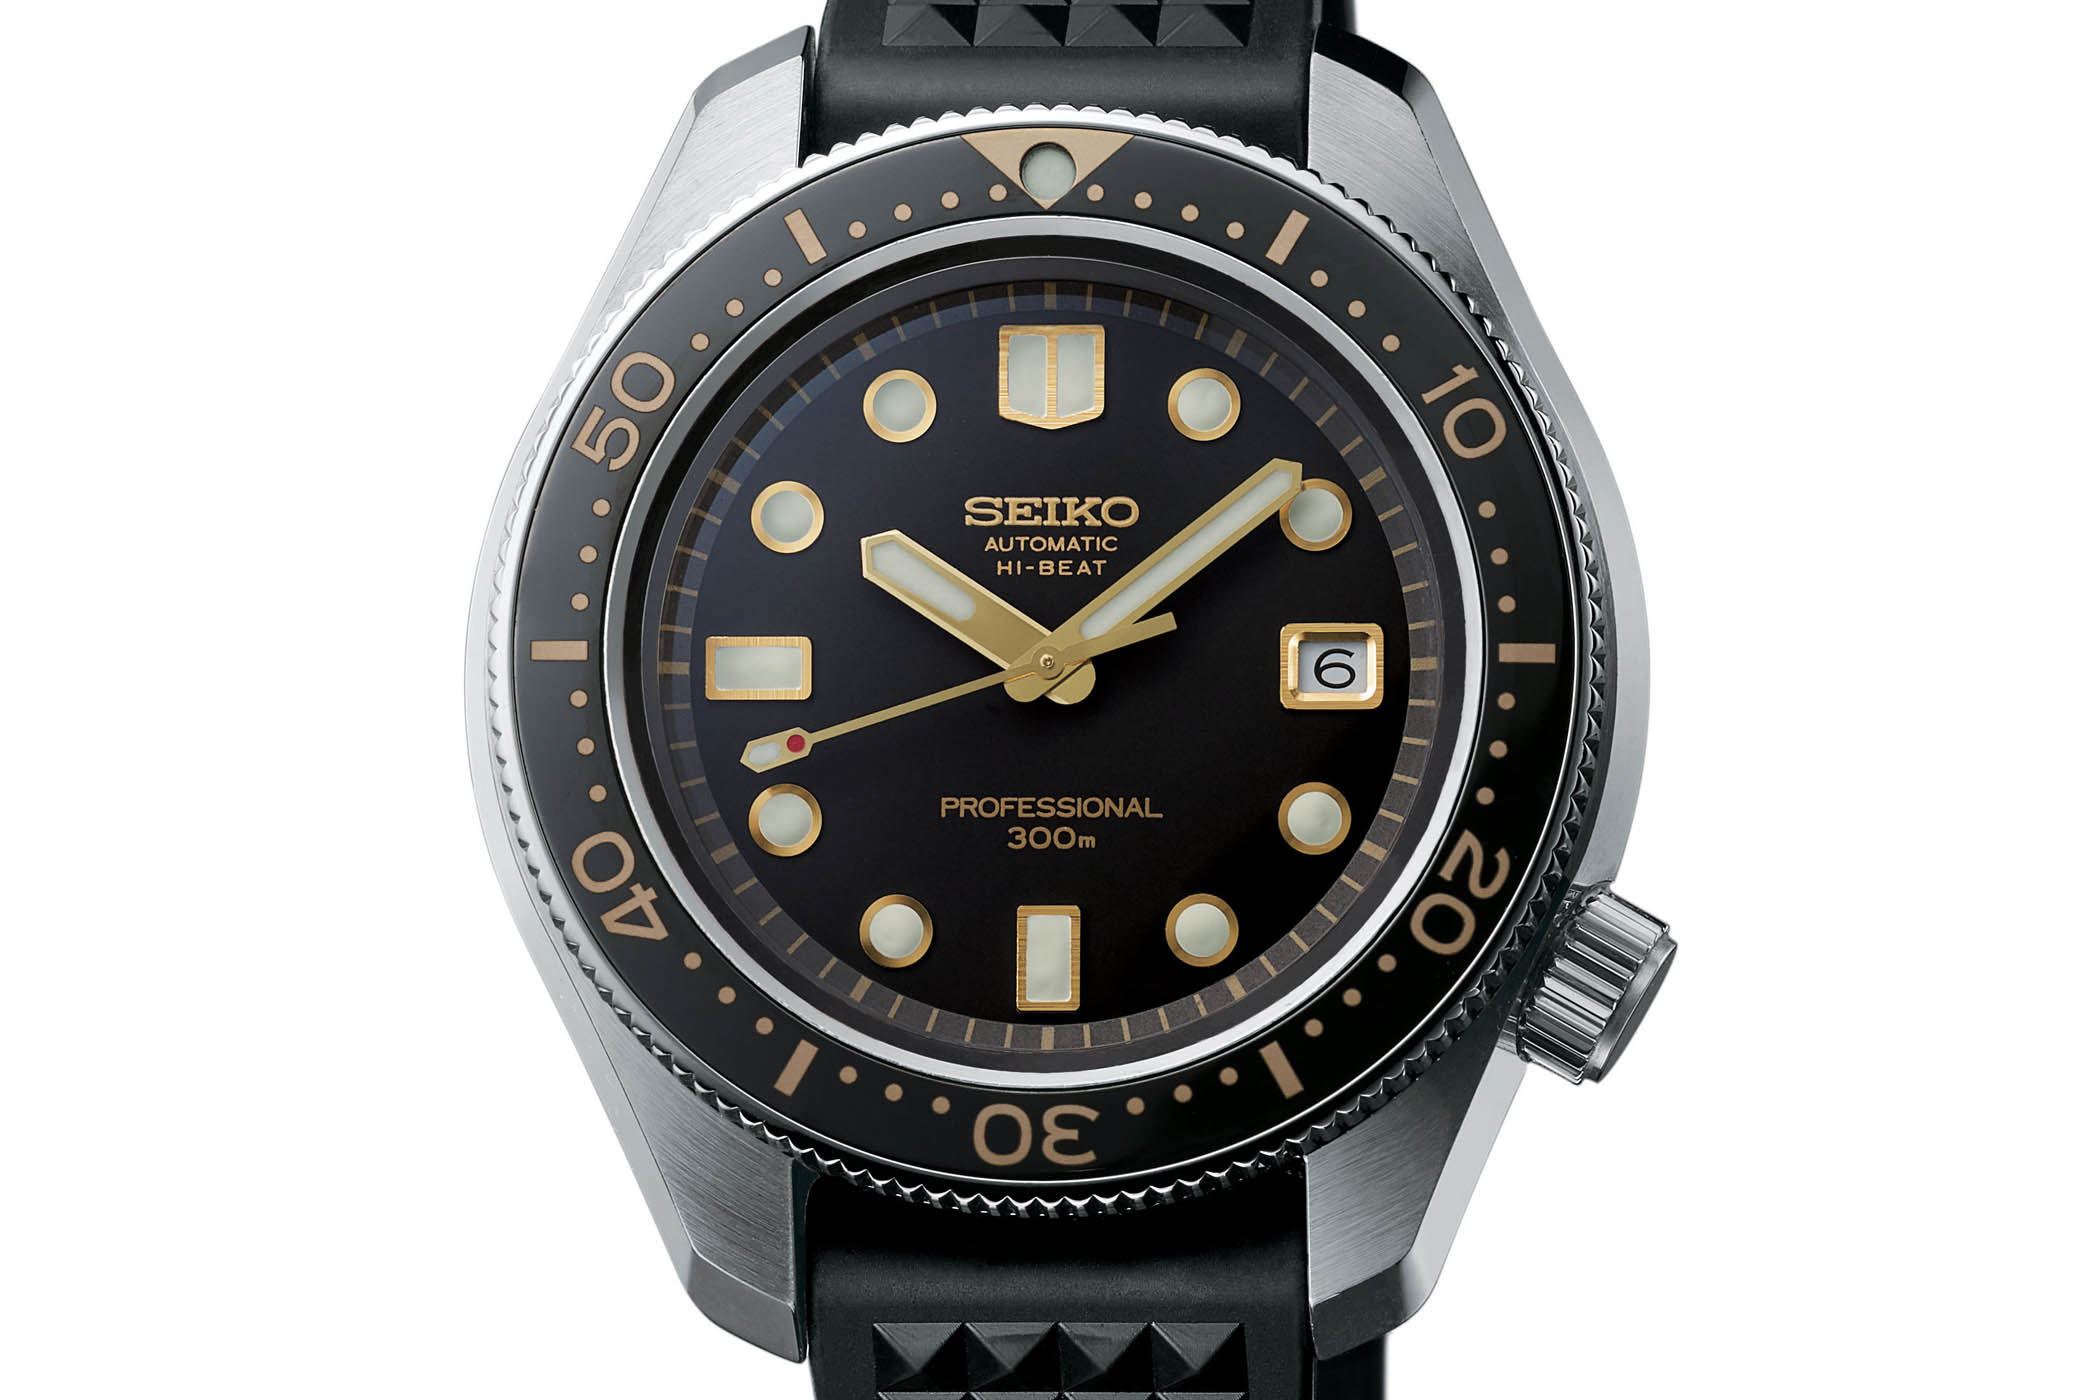 Baselworld 2018 - Seiko Prospex Diver 300m Hi-Beat SLA025 (Re-creation of the 1968 ref. 6159-7001) - Specs & Price